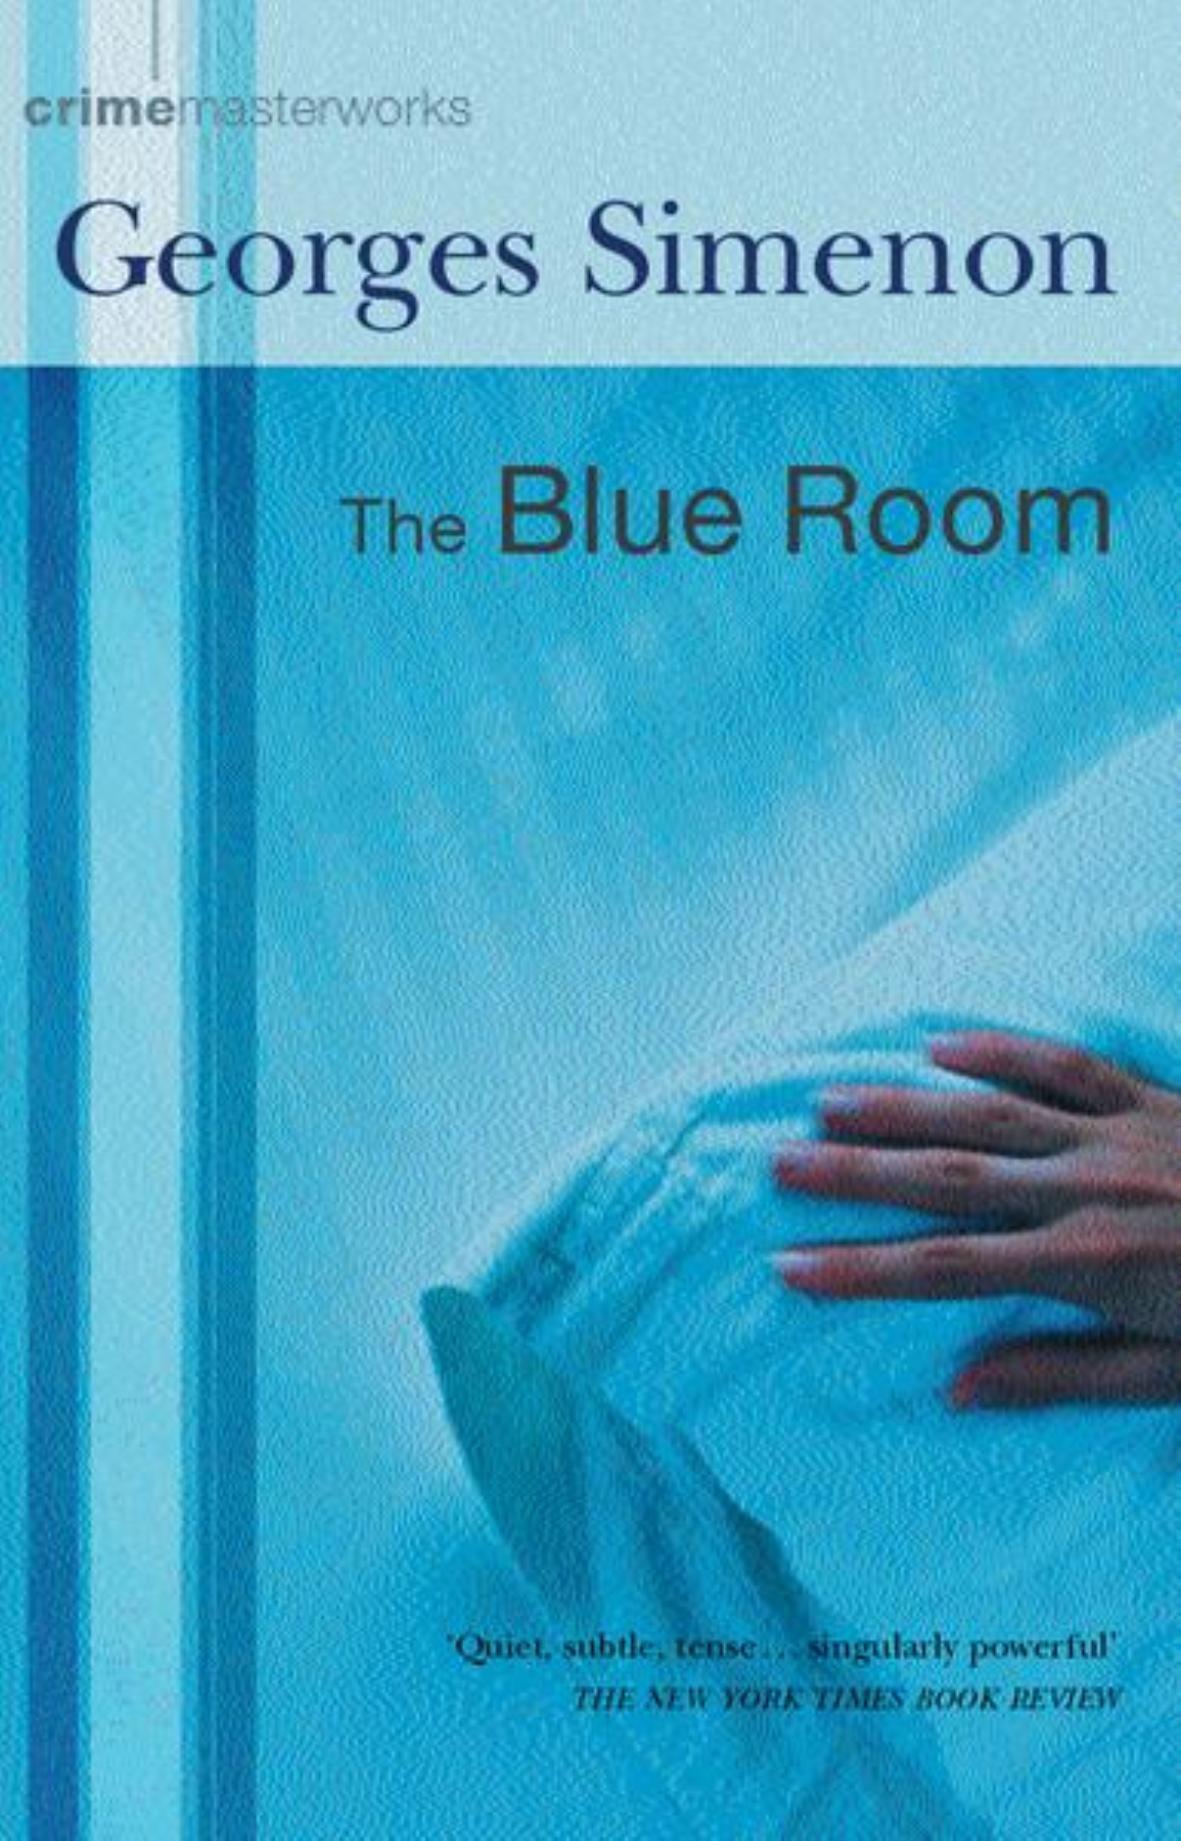 The Blue Room (Crime Masterworks) pdf epub